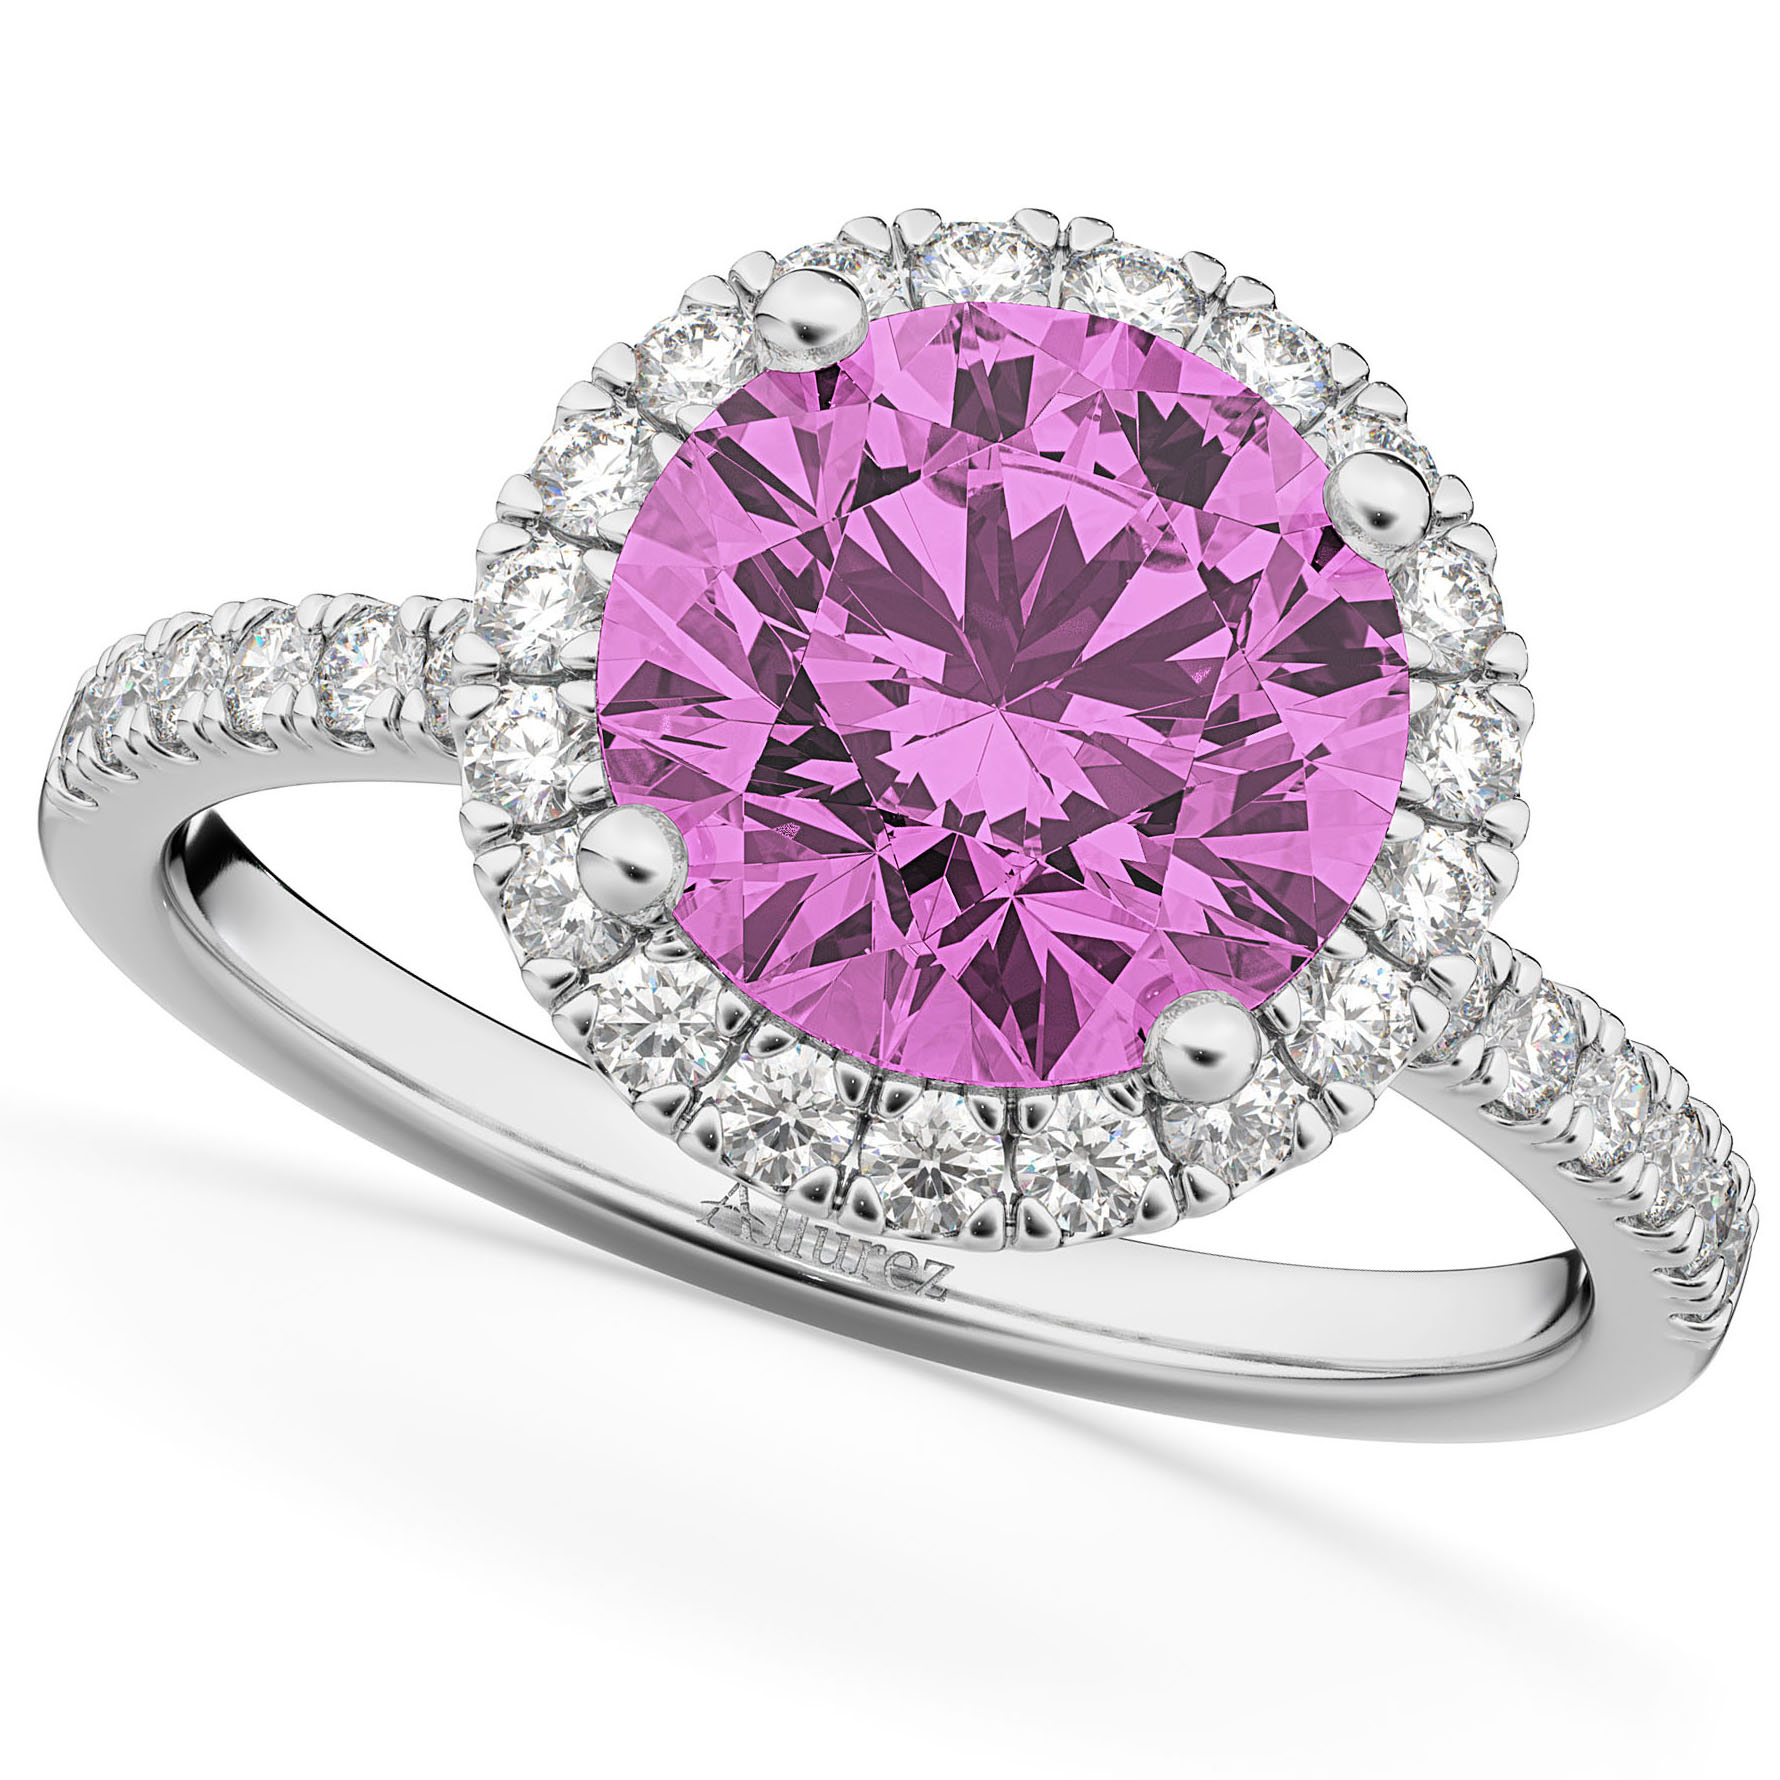 Halo Pink Sapphire & Diamond Engagement Ring 18K White Gold 2.80ct